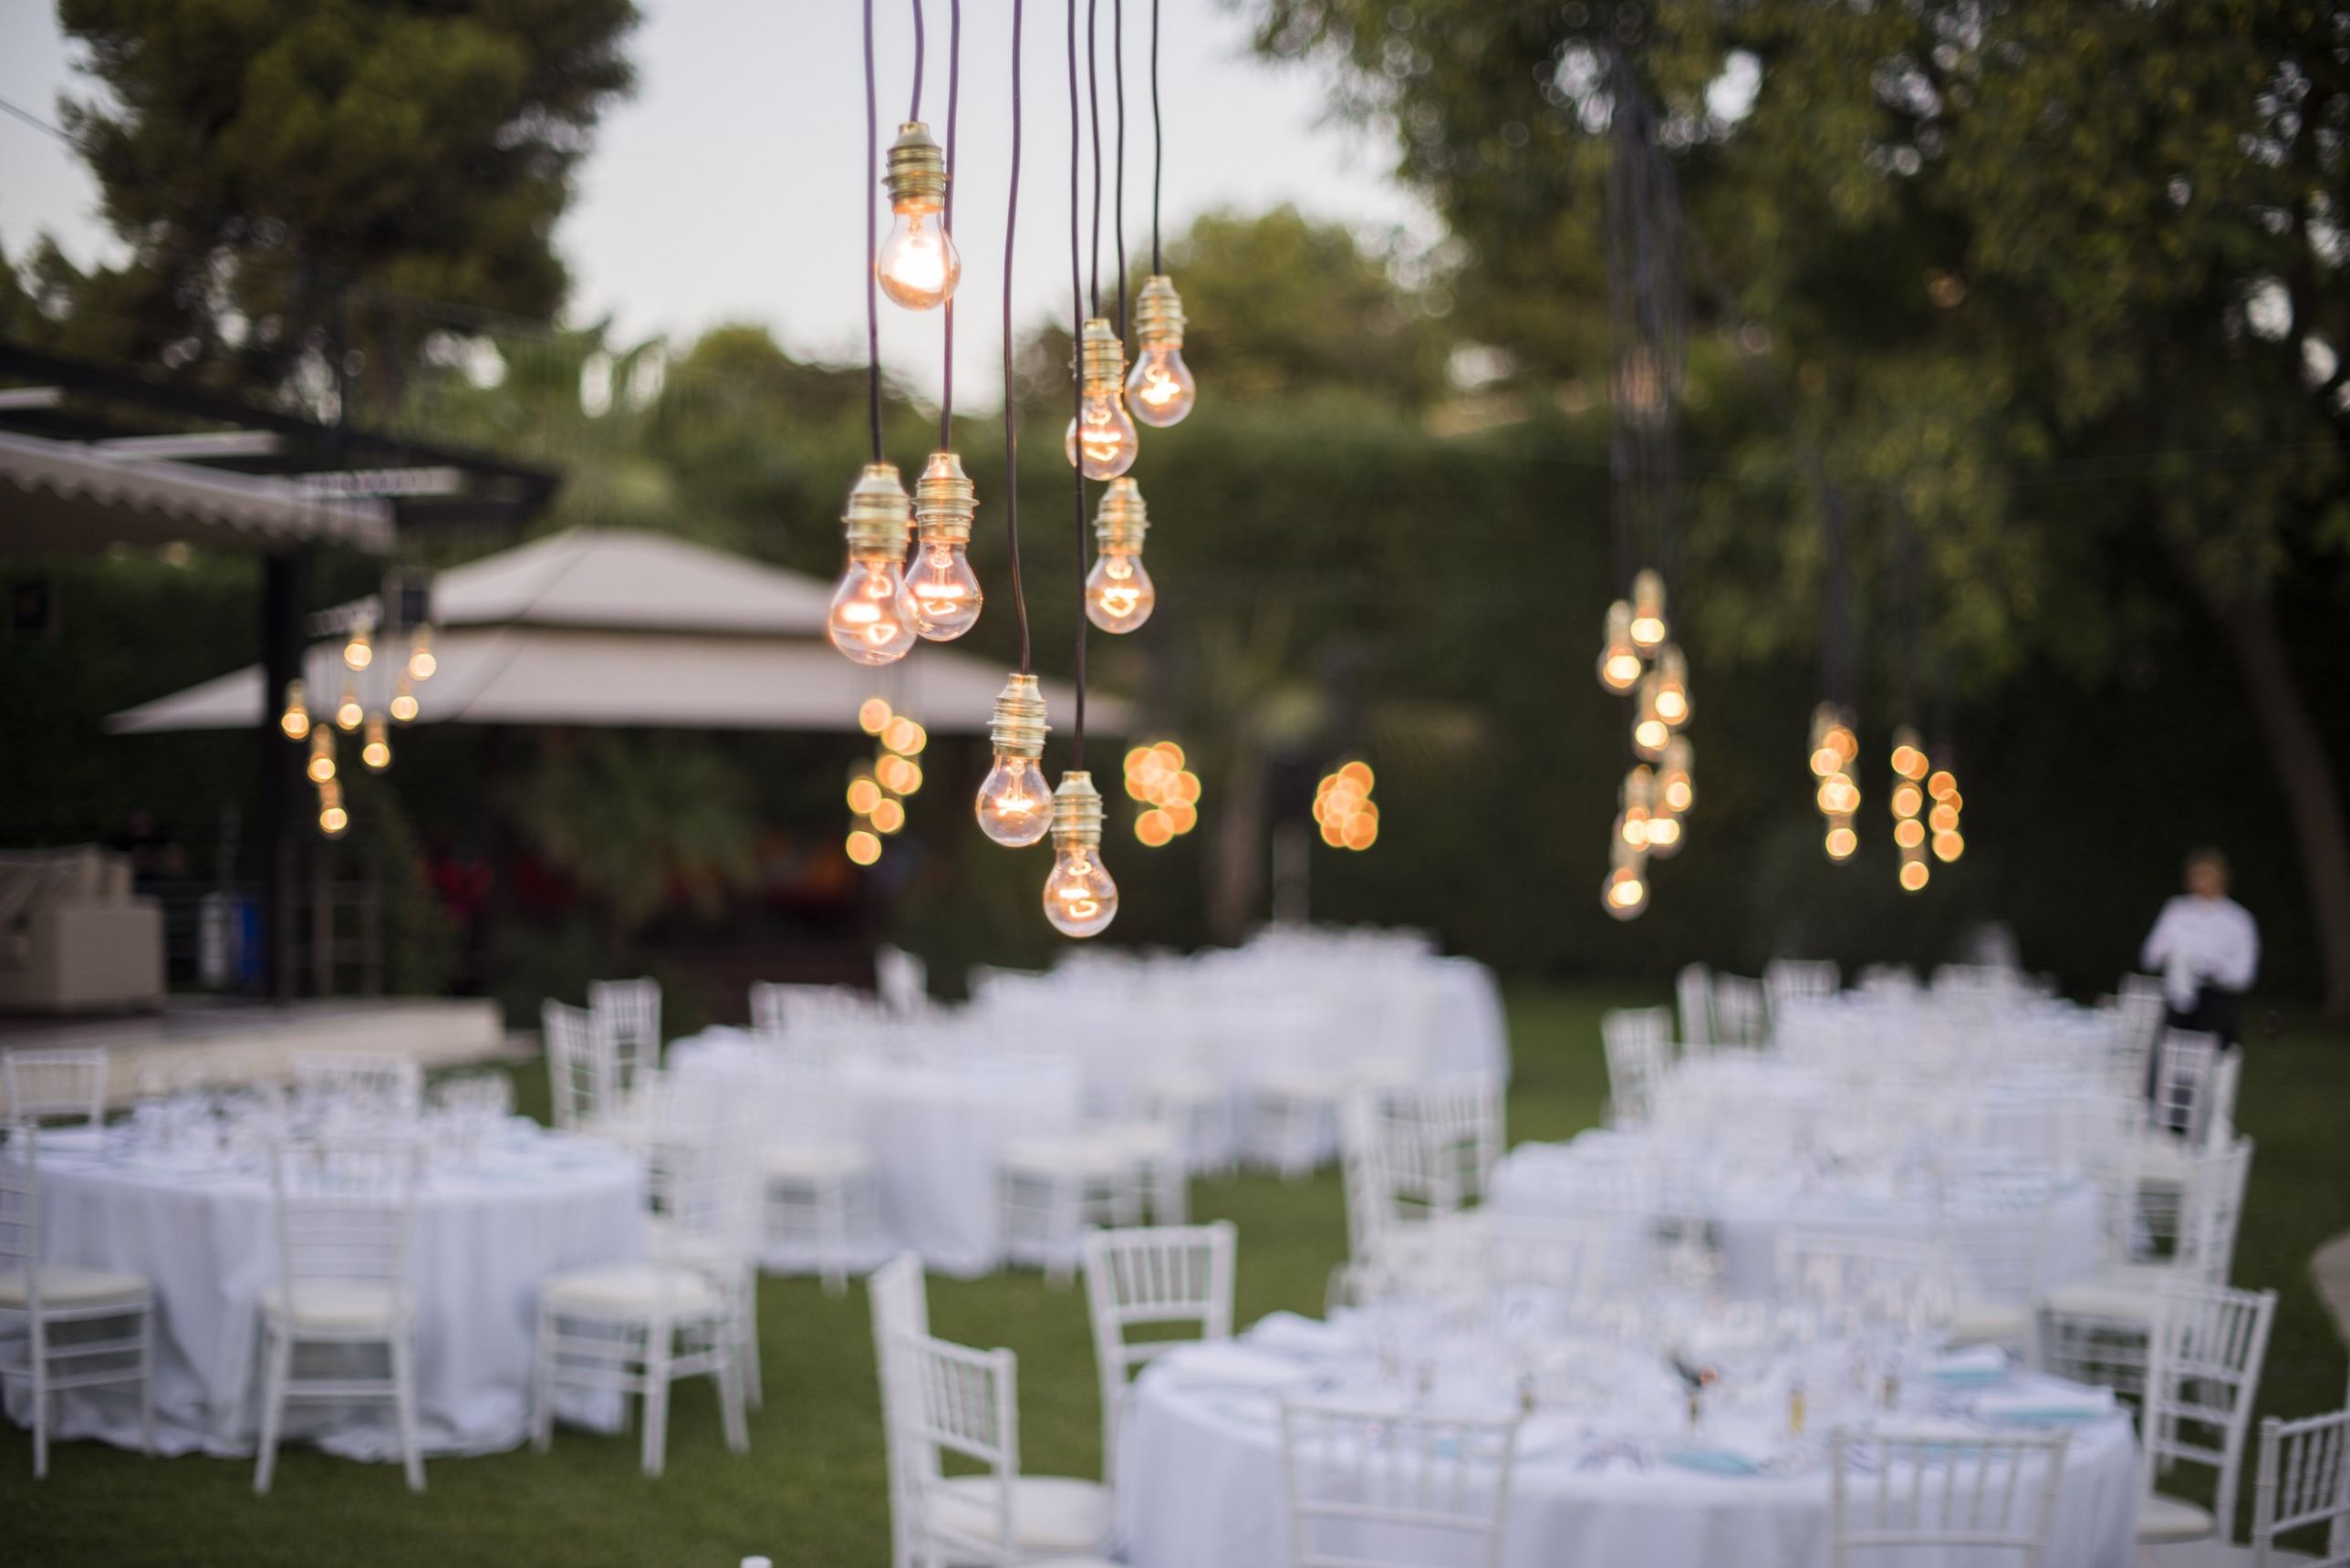 Si-Quiero-Wedding-Planner-By-Sira-Antequera-Bodas-Málaga-Marbella-Miami- Nicole-Guille-9